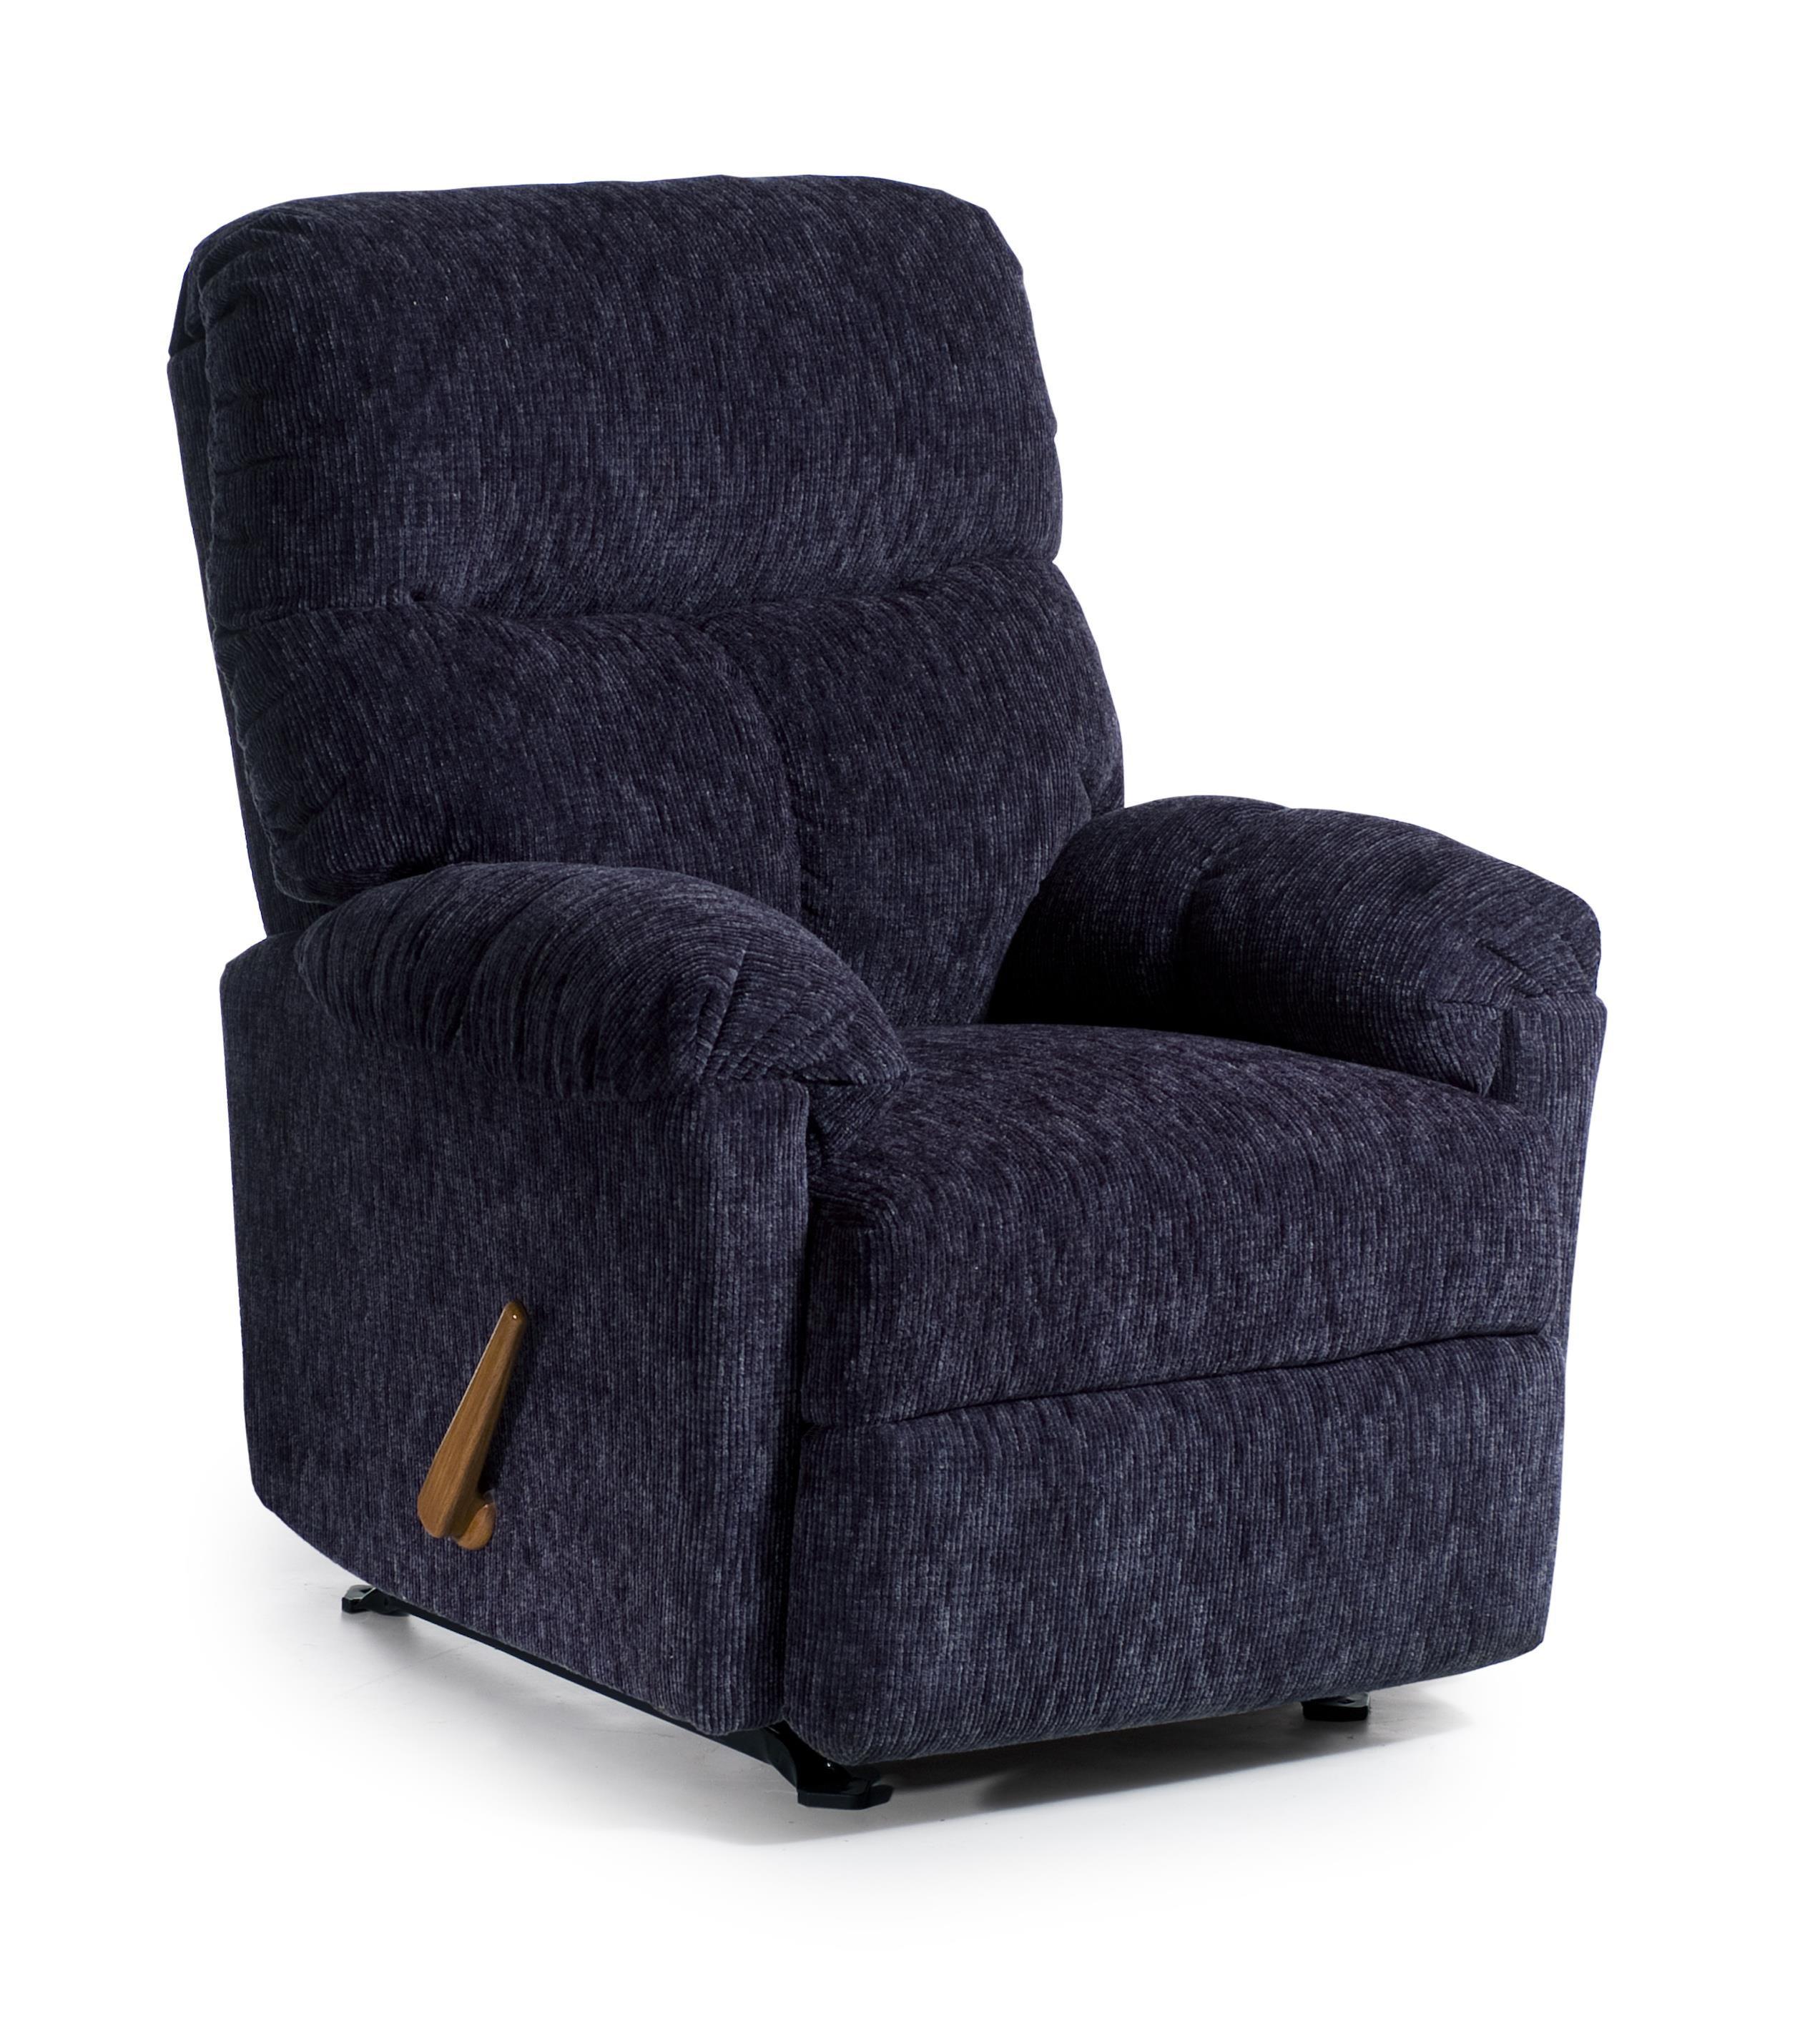 Best Home Furnishings Todd Swivel Rocker Recliner  sc 1 st  Rifeu0027s Home Furniture & Best Home Furnishings Todd Swivel Rocker Recliner - Rifeu0027s Home ... islam-shia.org